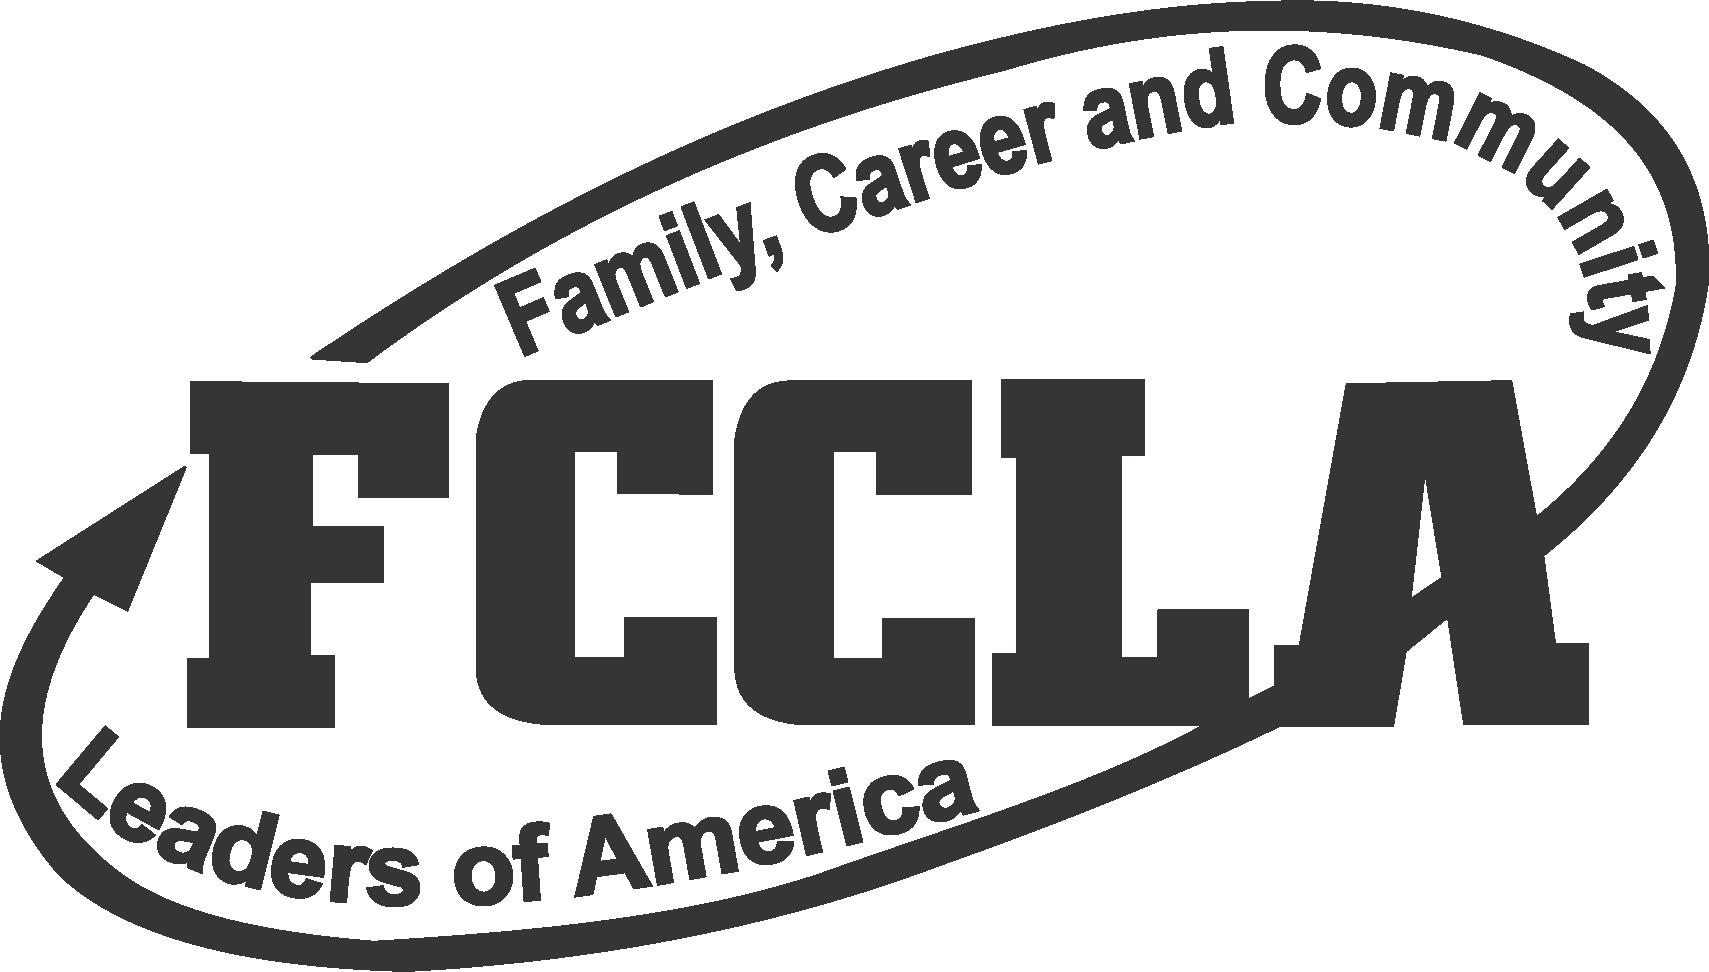 FCCLA Official